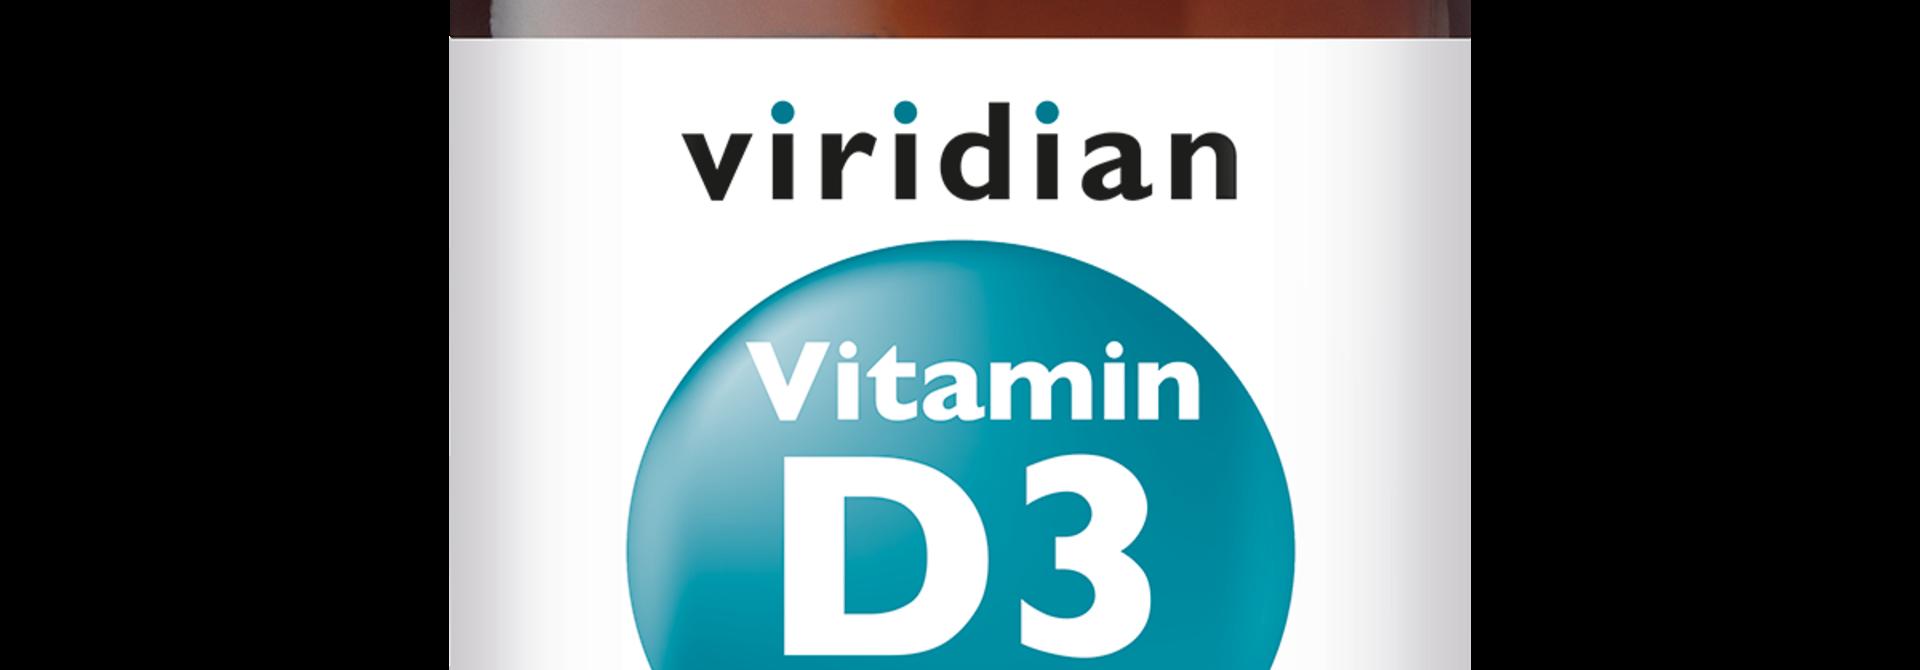 Vitamin D3 (Vegan) 400 IU (10 mcg) 30 plantaardige capsules